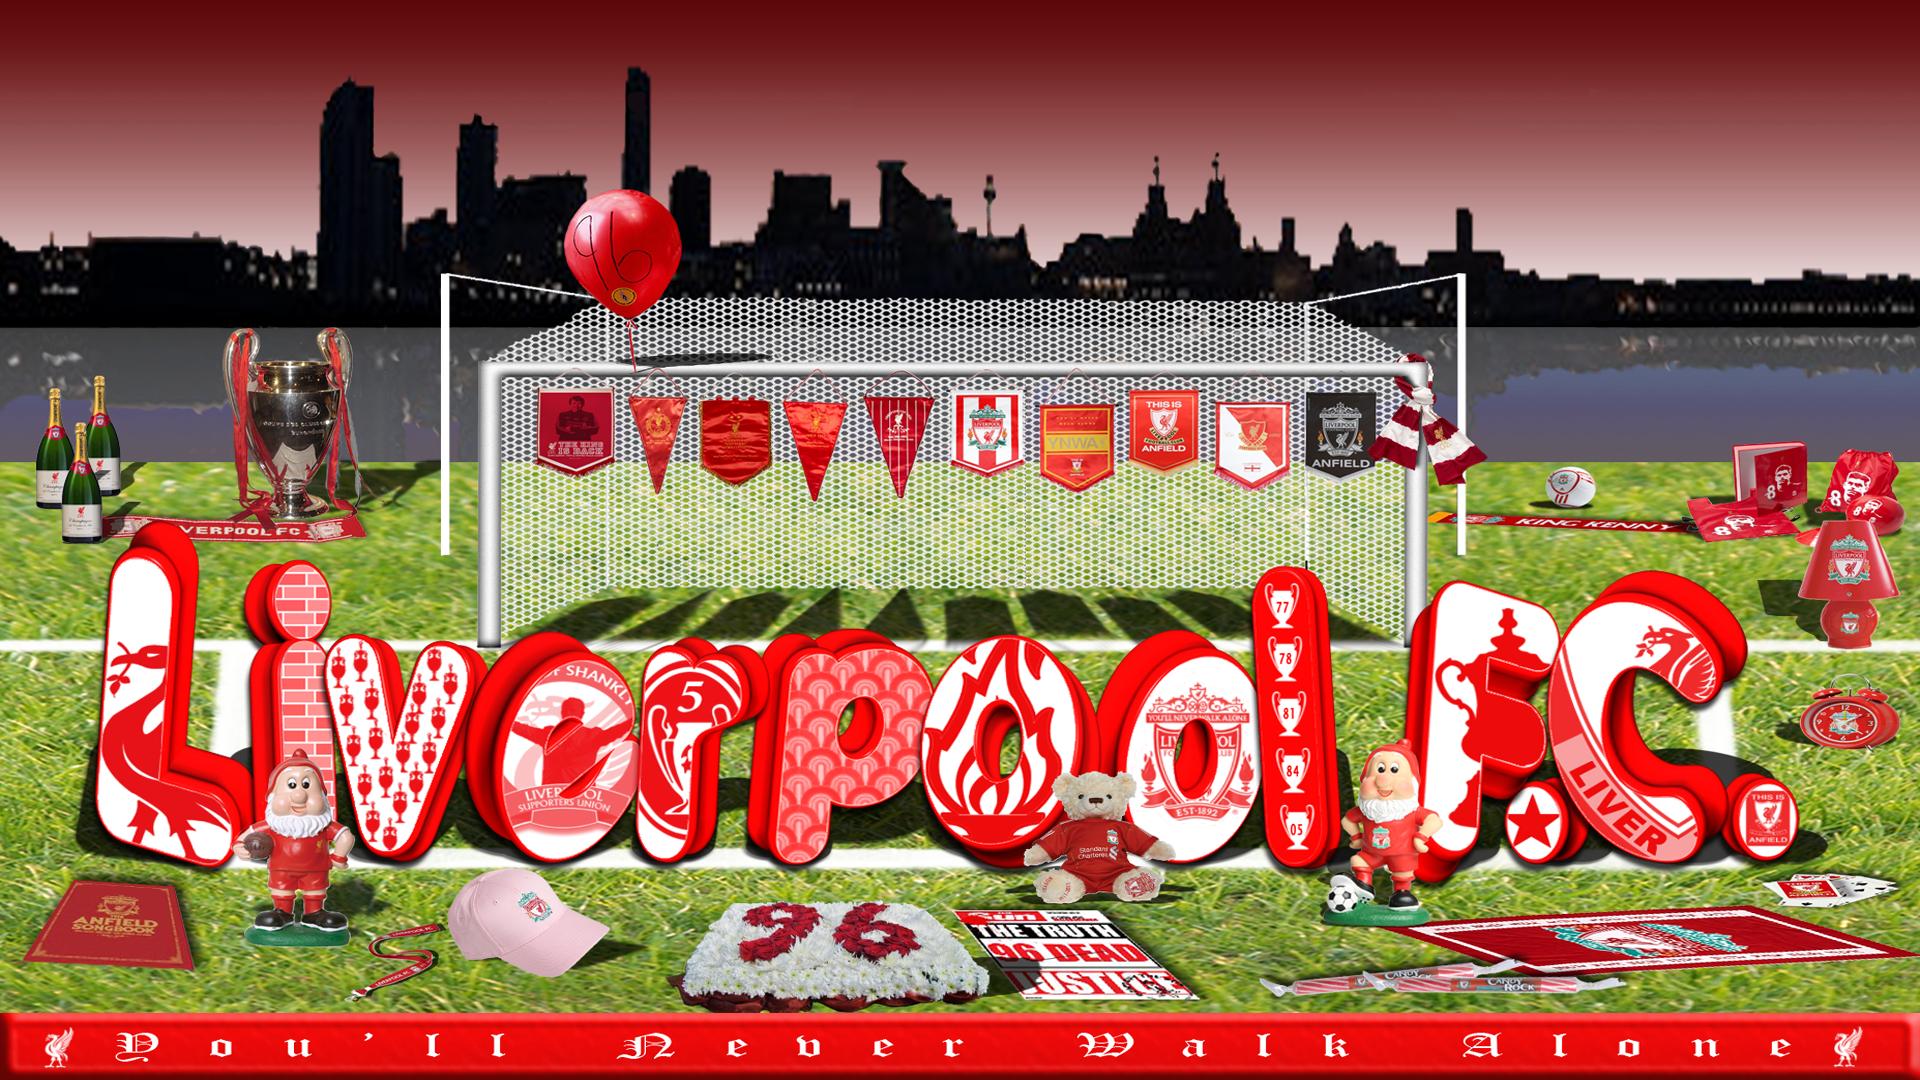 Liverpool Fc Desktop Wallpaper 1920x1080 By Leroysunshine On Deviantart